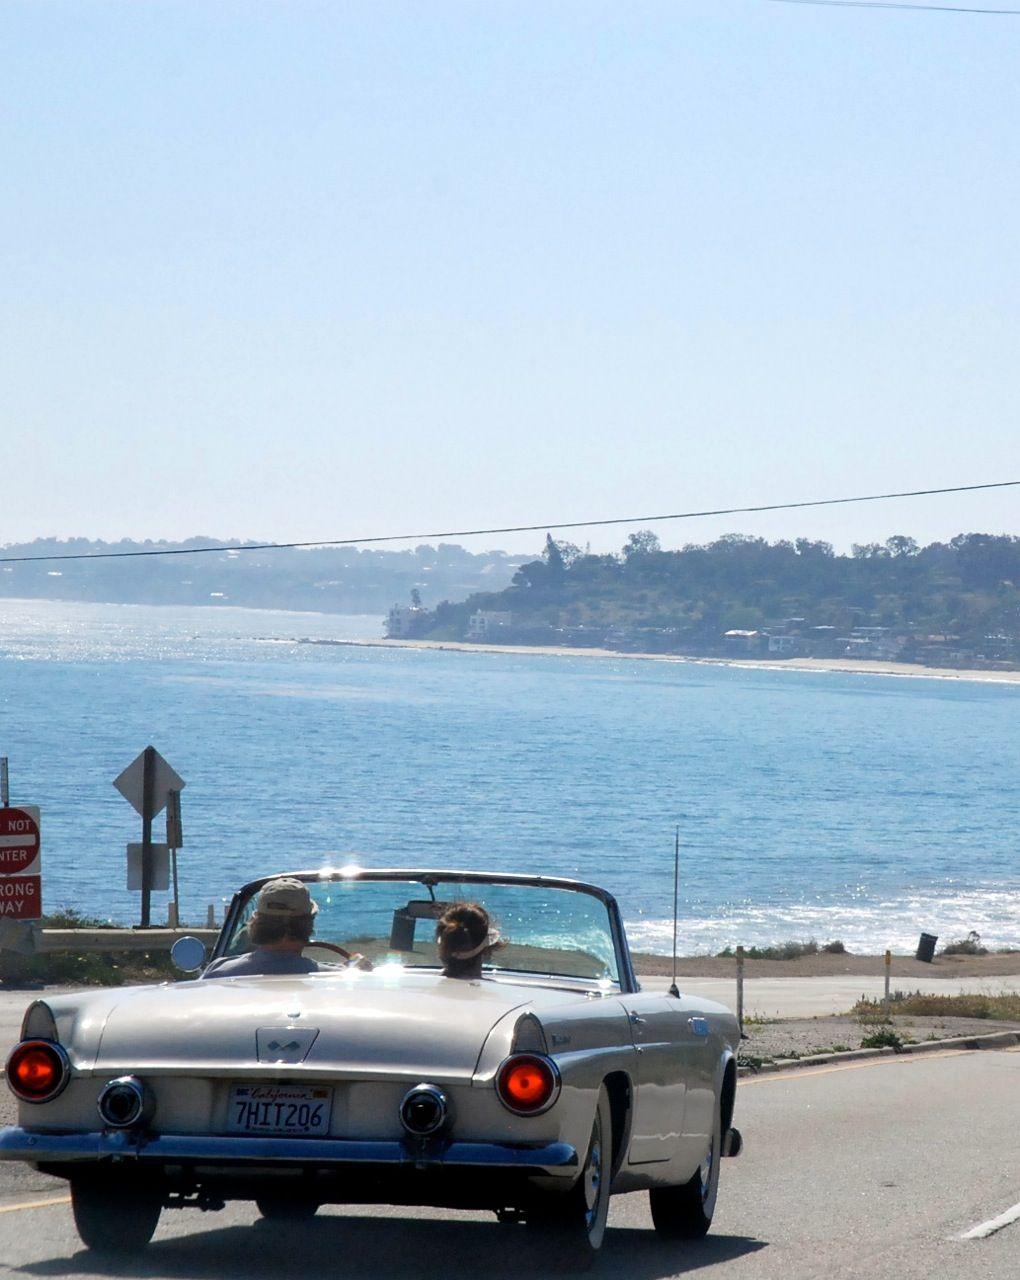 Corvette convertible approaching Paradise Cove in Malibu